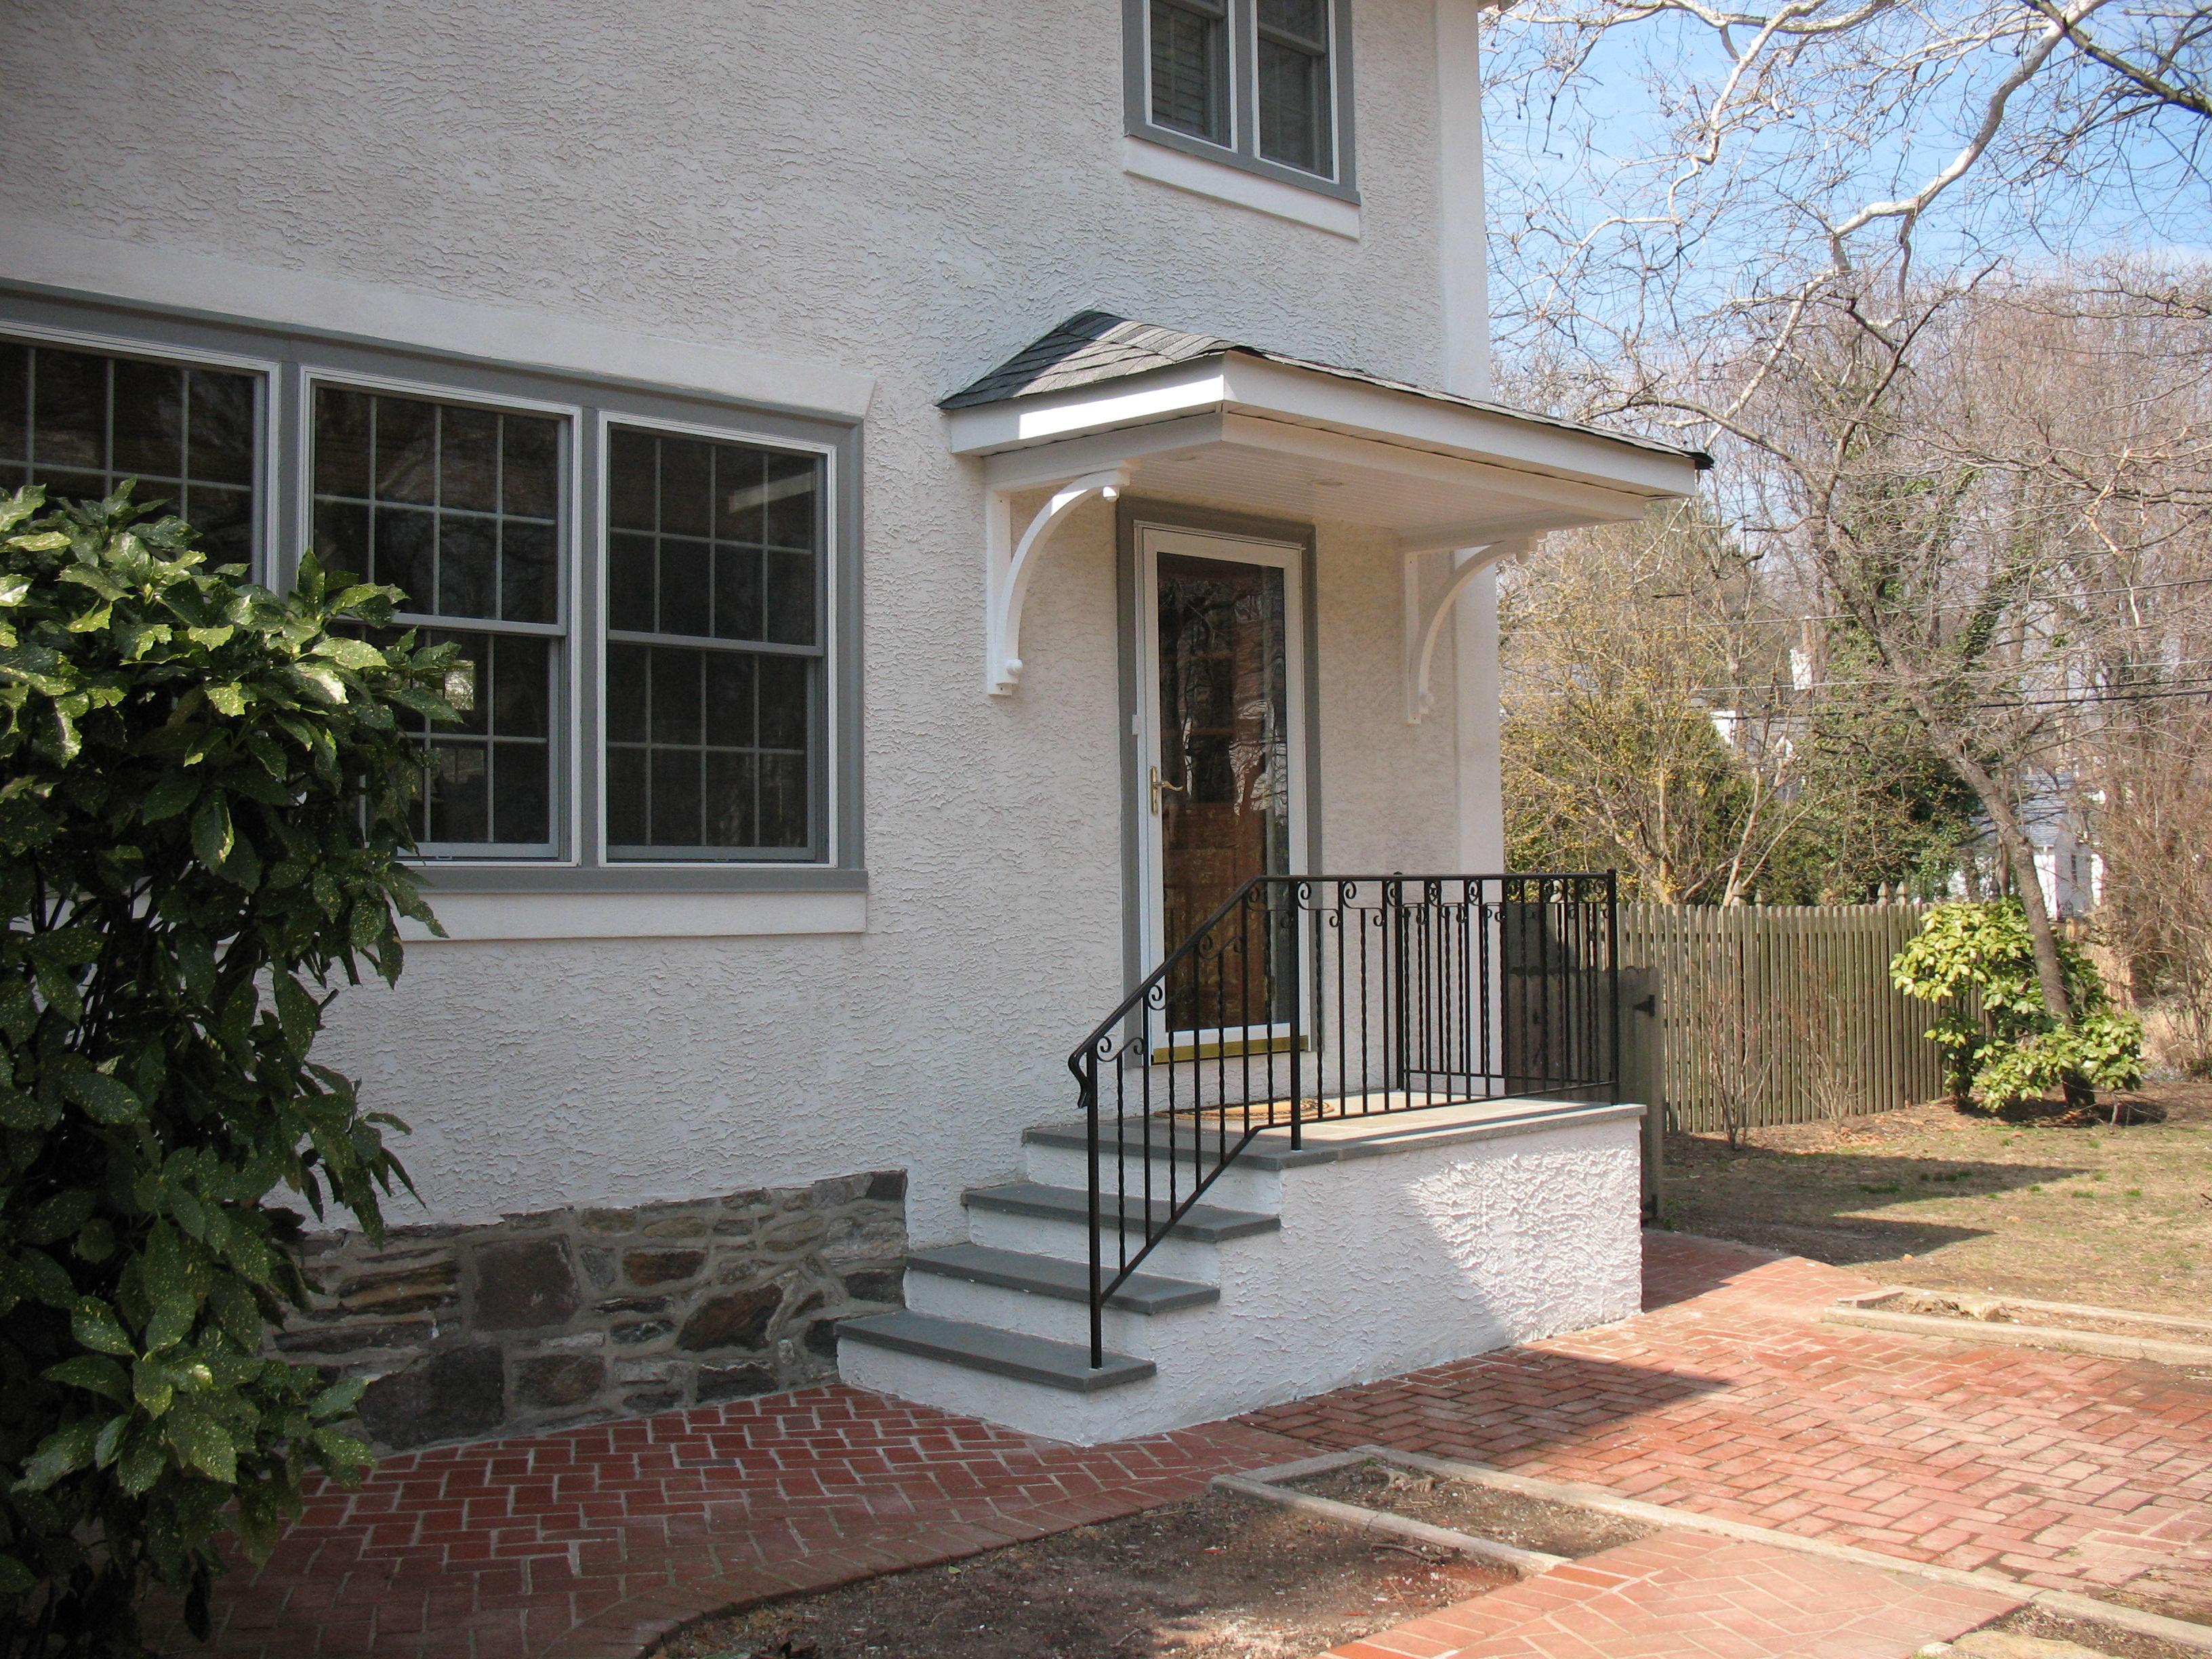 Side Entrance Porch Designs Shapeyourminds throughout dimensions 3264 X 2448